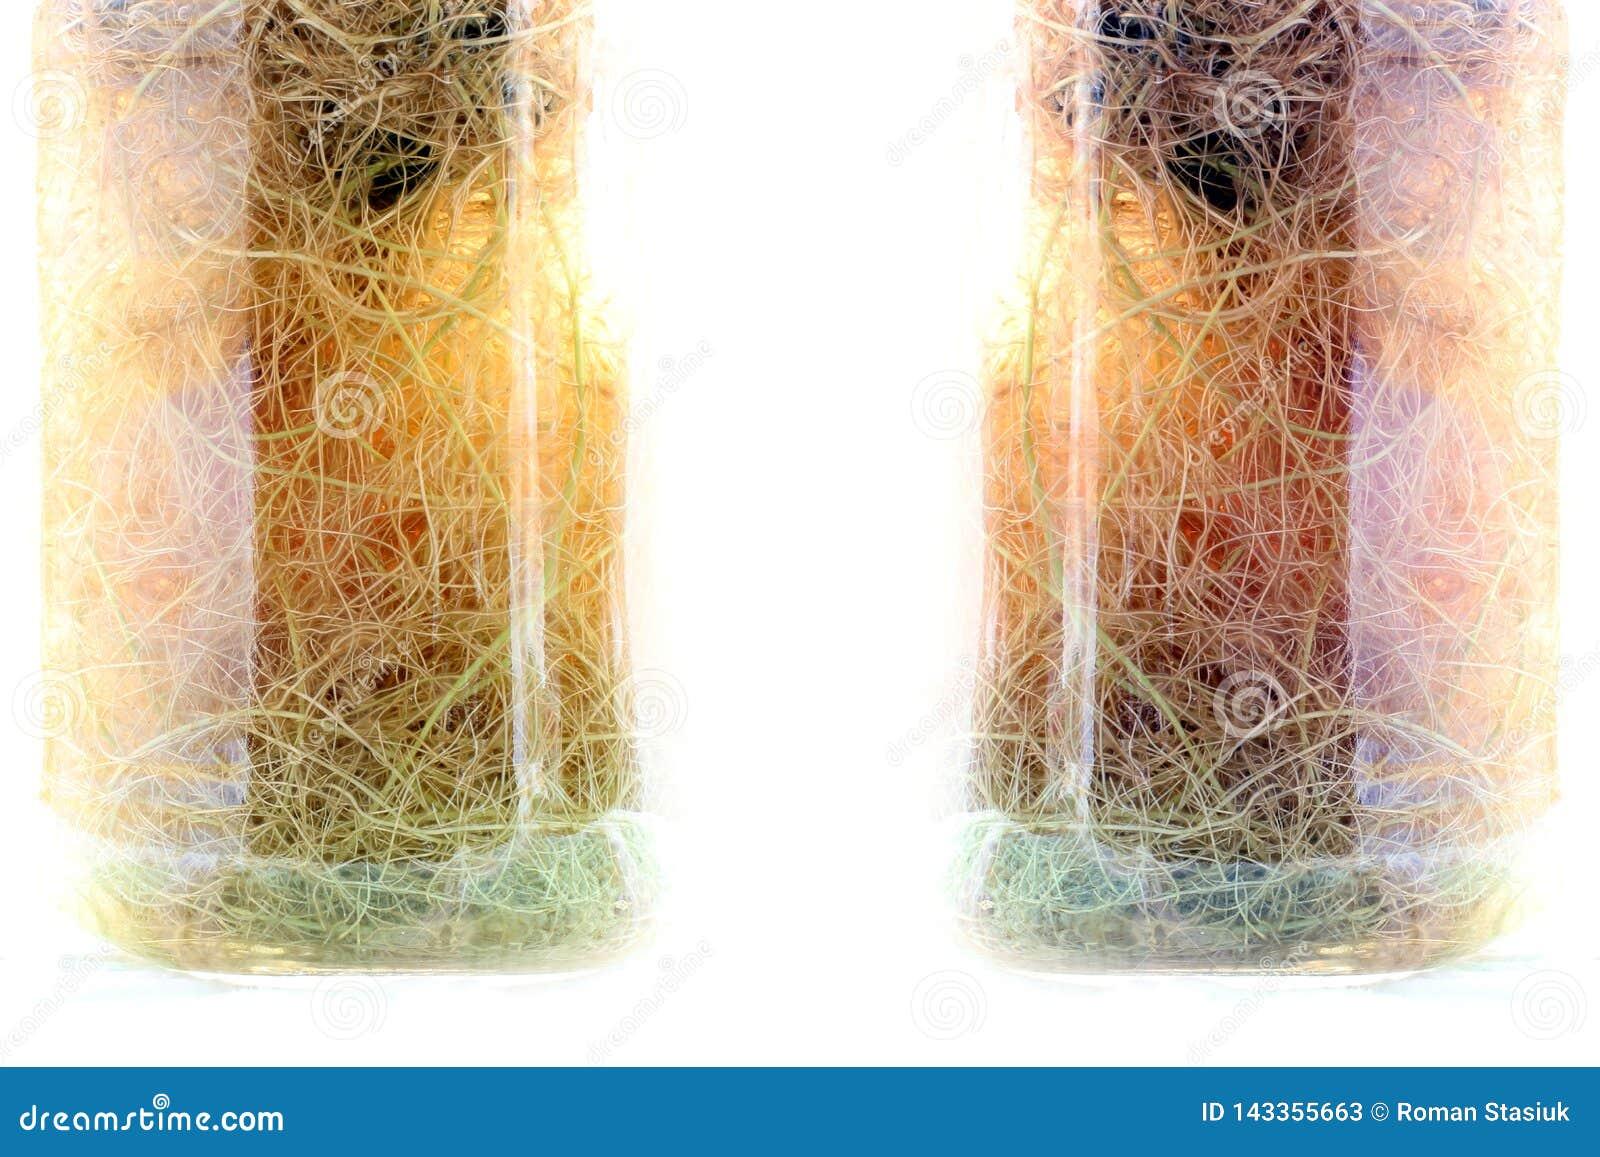 Composition in a glass vase. Decorative vase